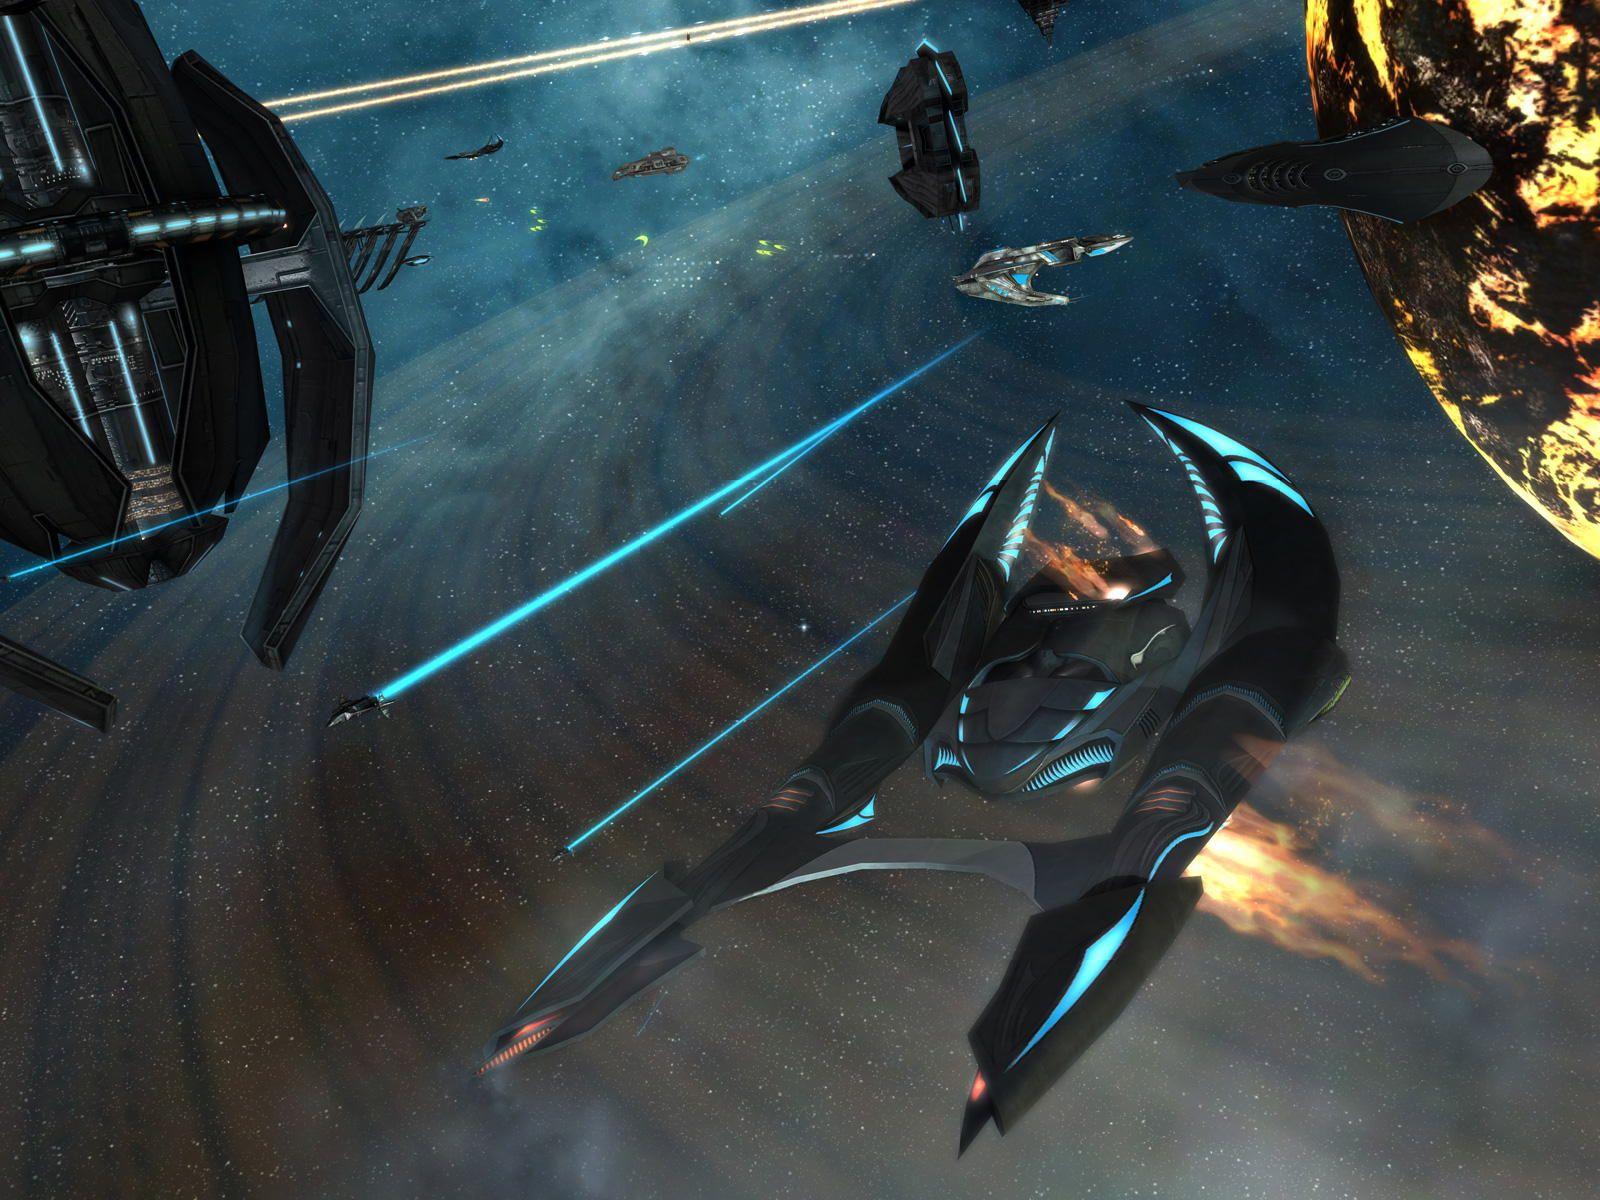 Sci Fi Spaceship Sins Of A Solar Empire Wallpaper Spaceships